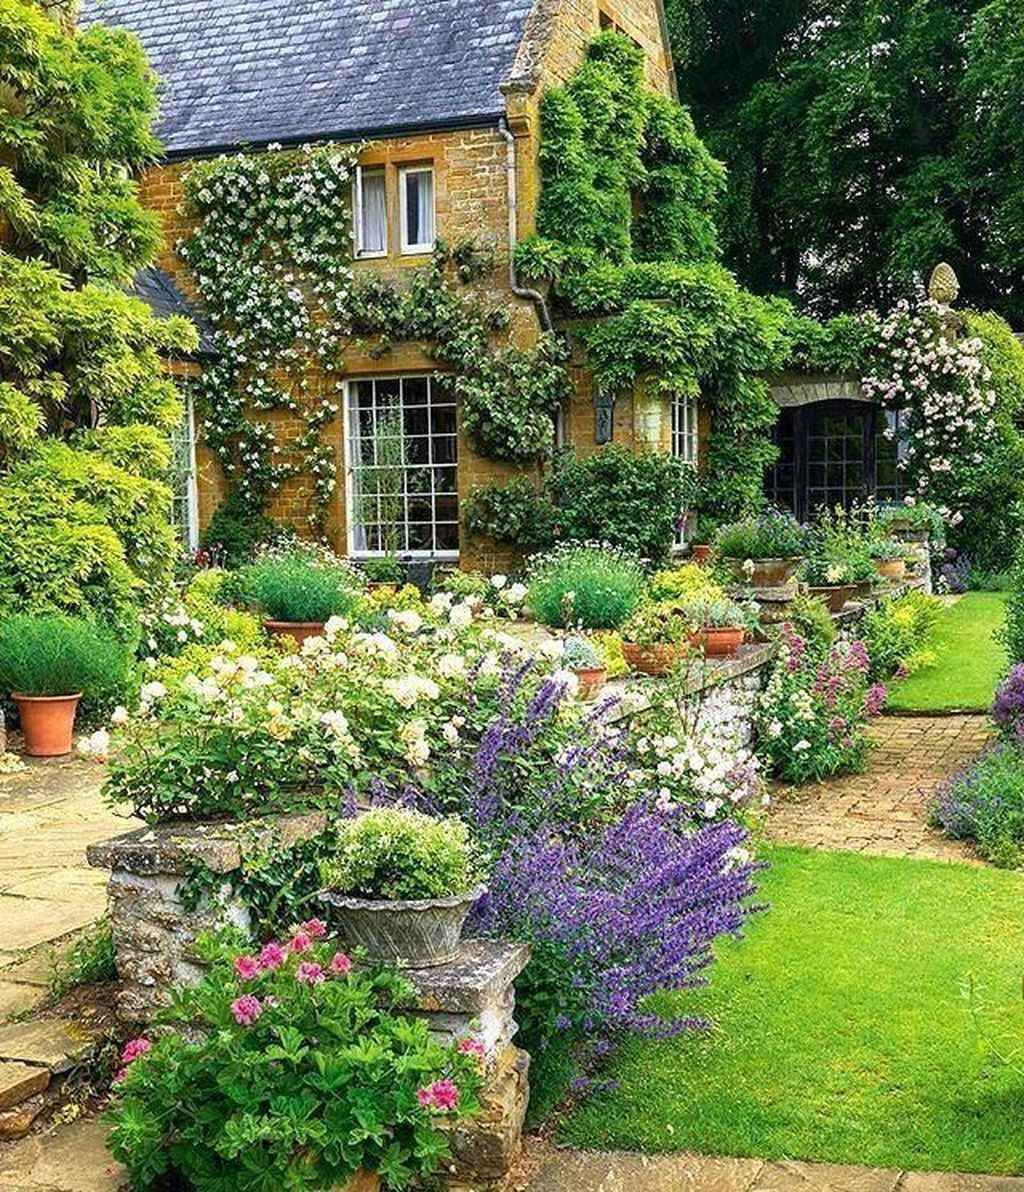 22 Incredible Budget Gardening Ideas: 89 Beautiful Front Yard Cottage Garden Inspiration Ideas